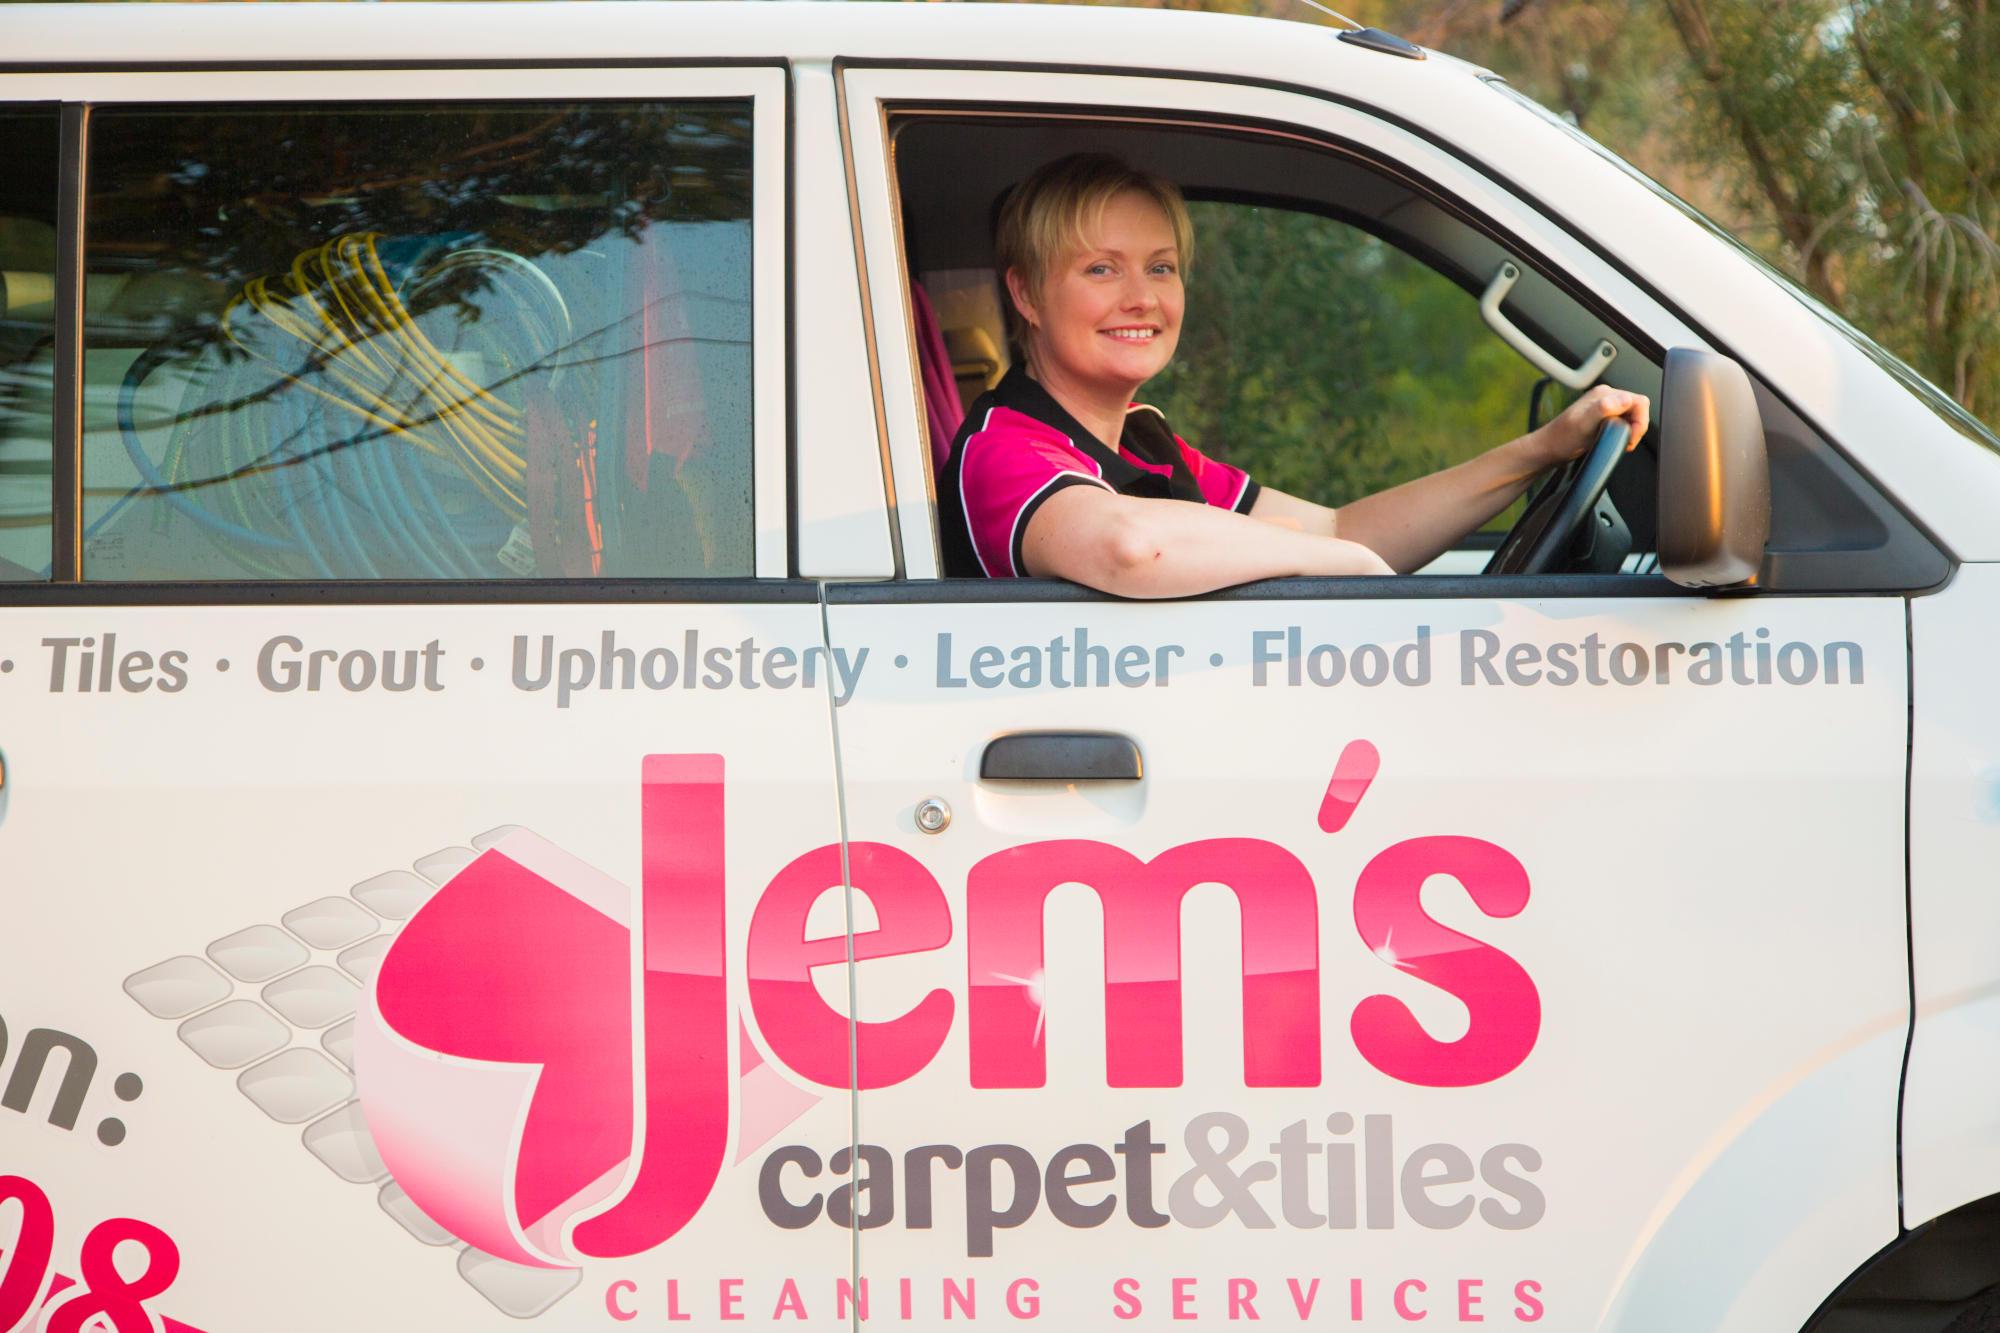 Jem inside her van